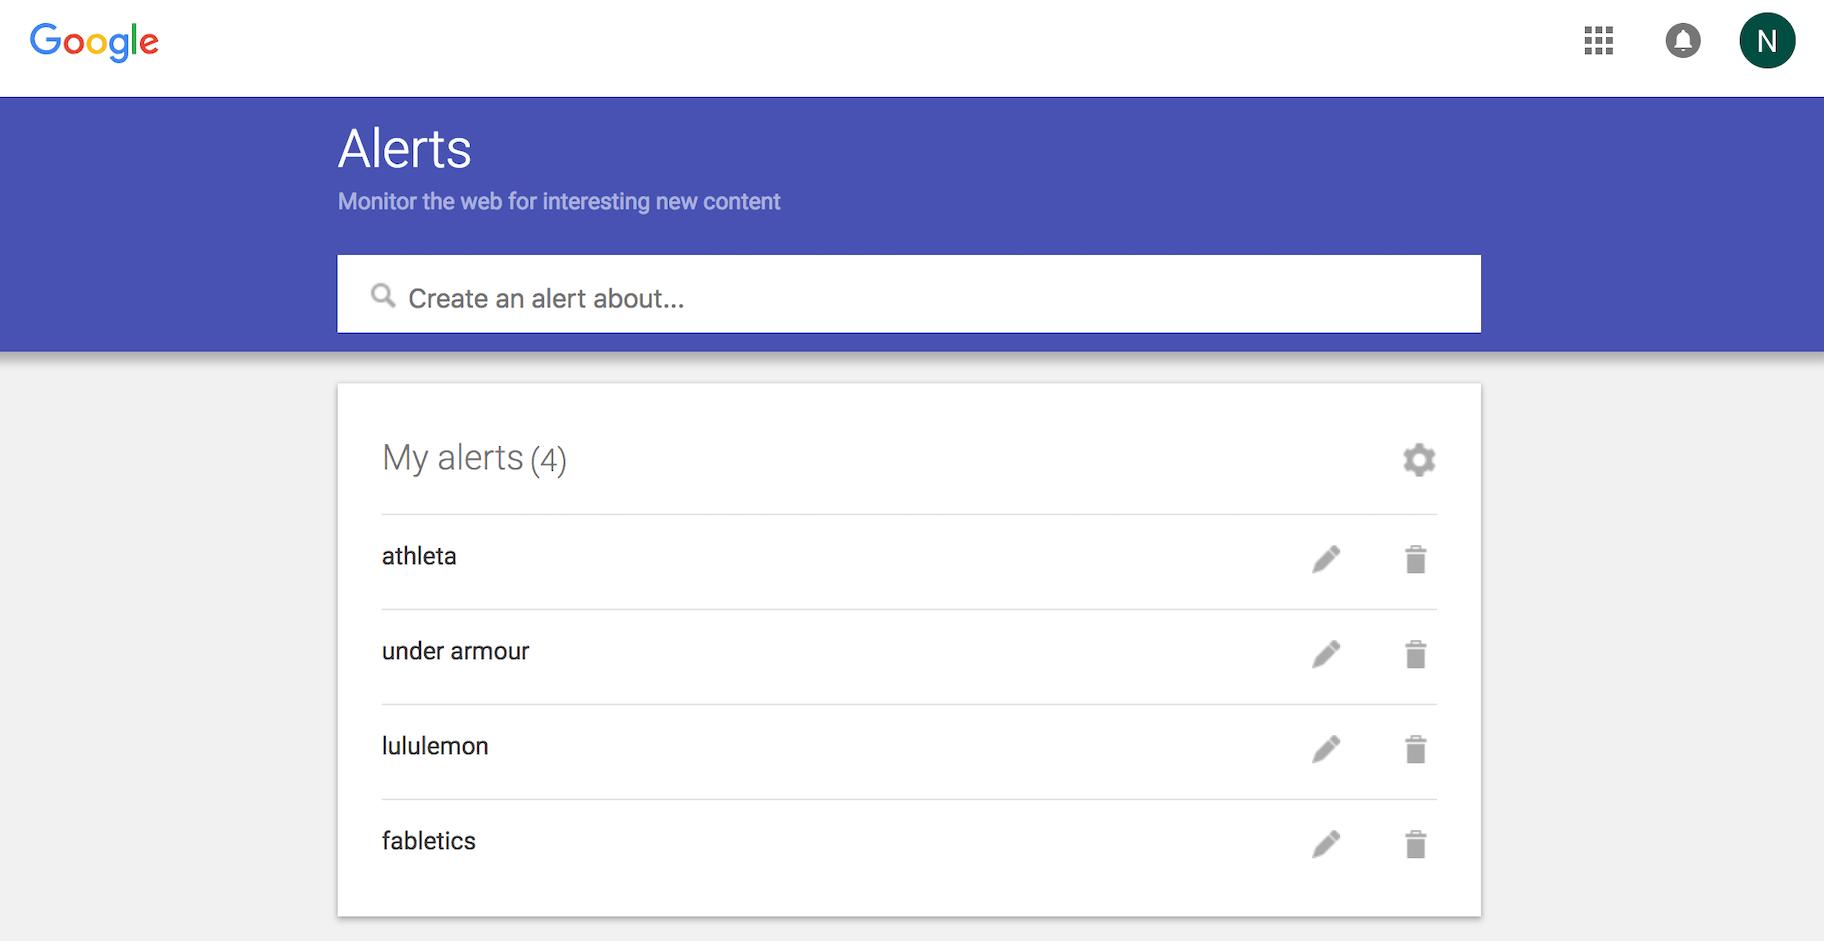 Marketing Mix & Marketingstrategien - Google Alerts